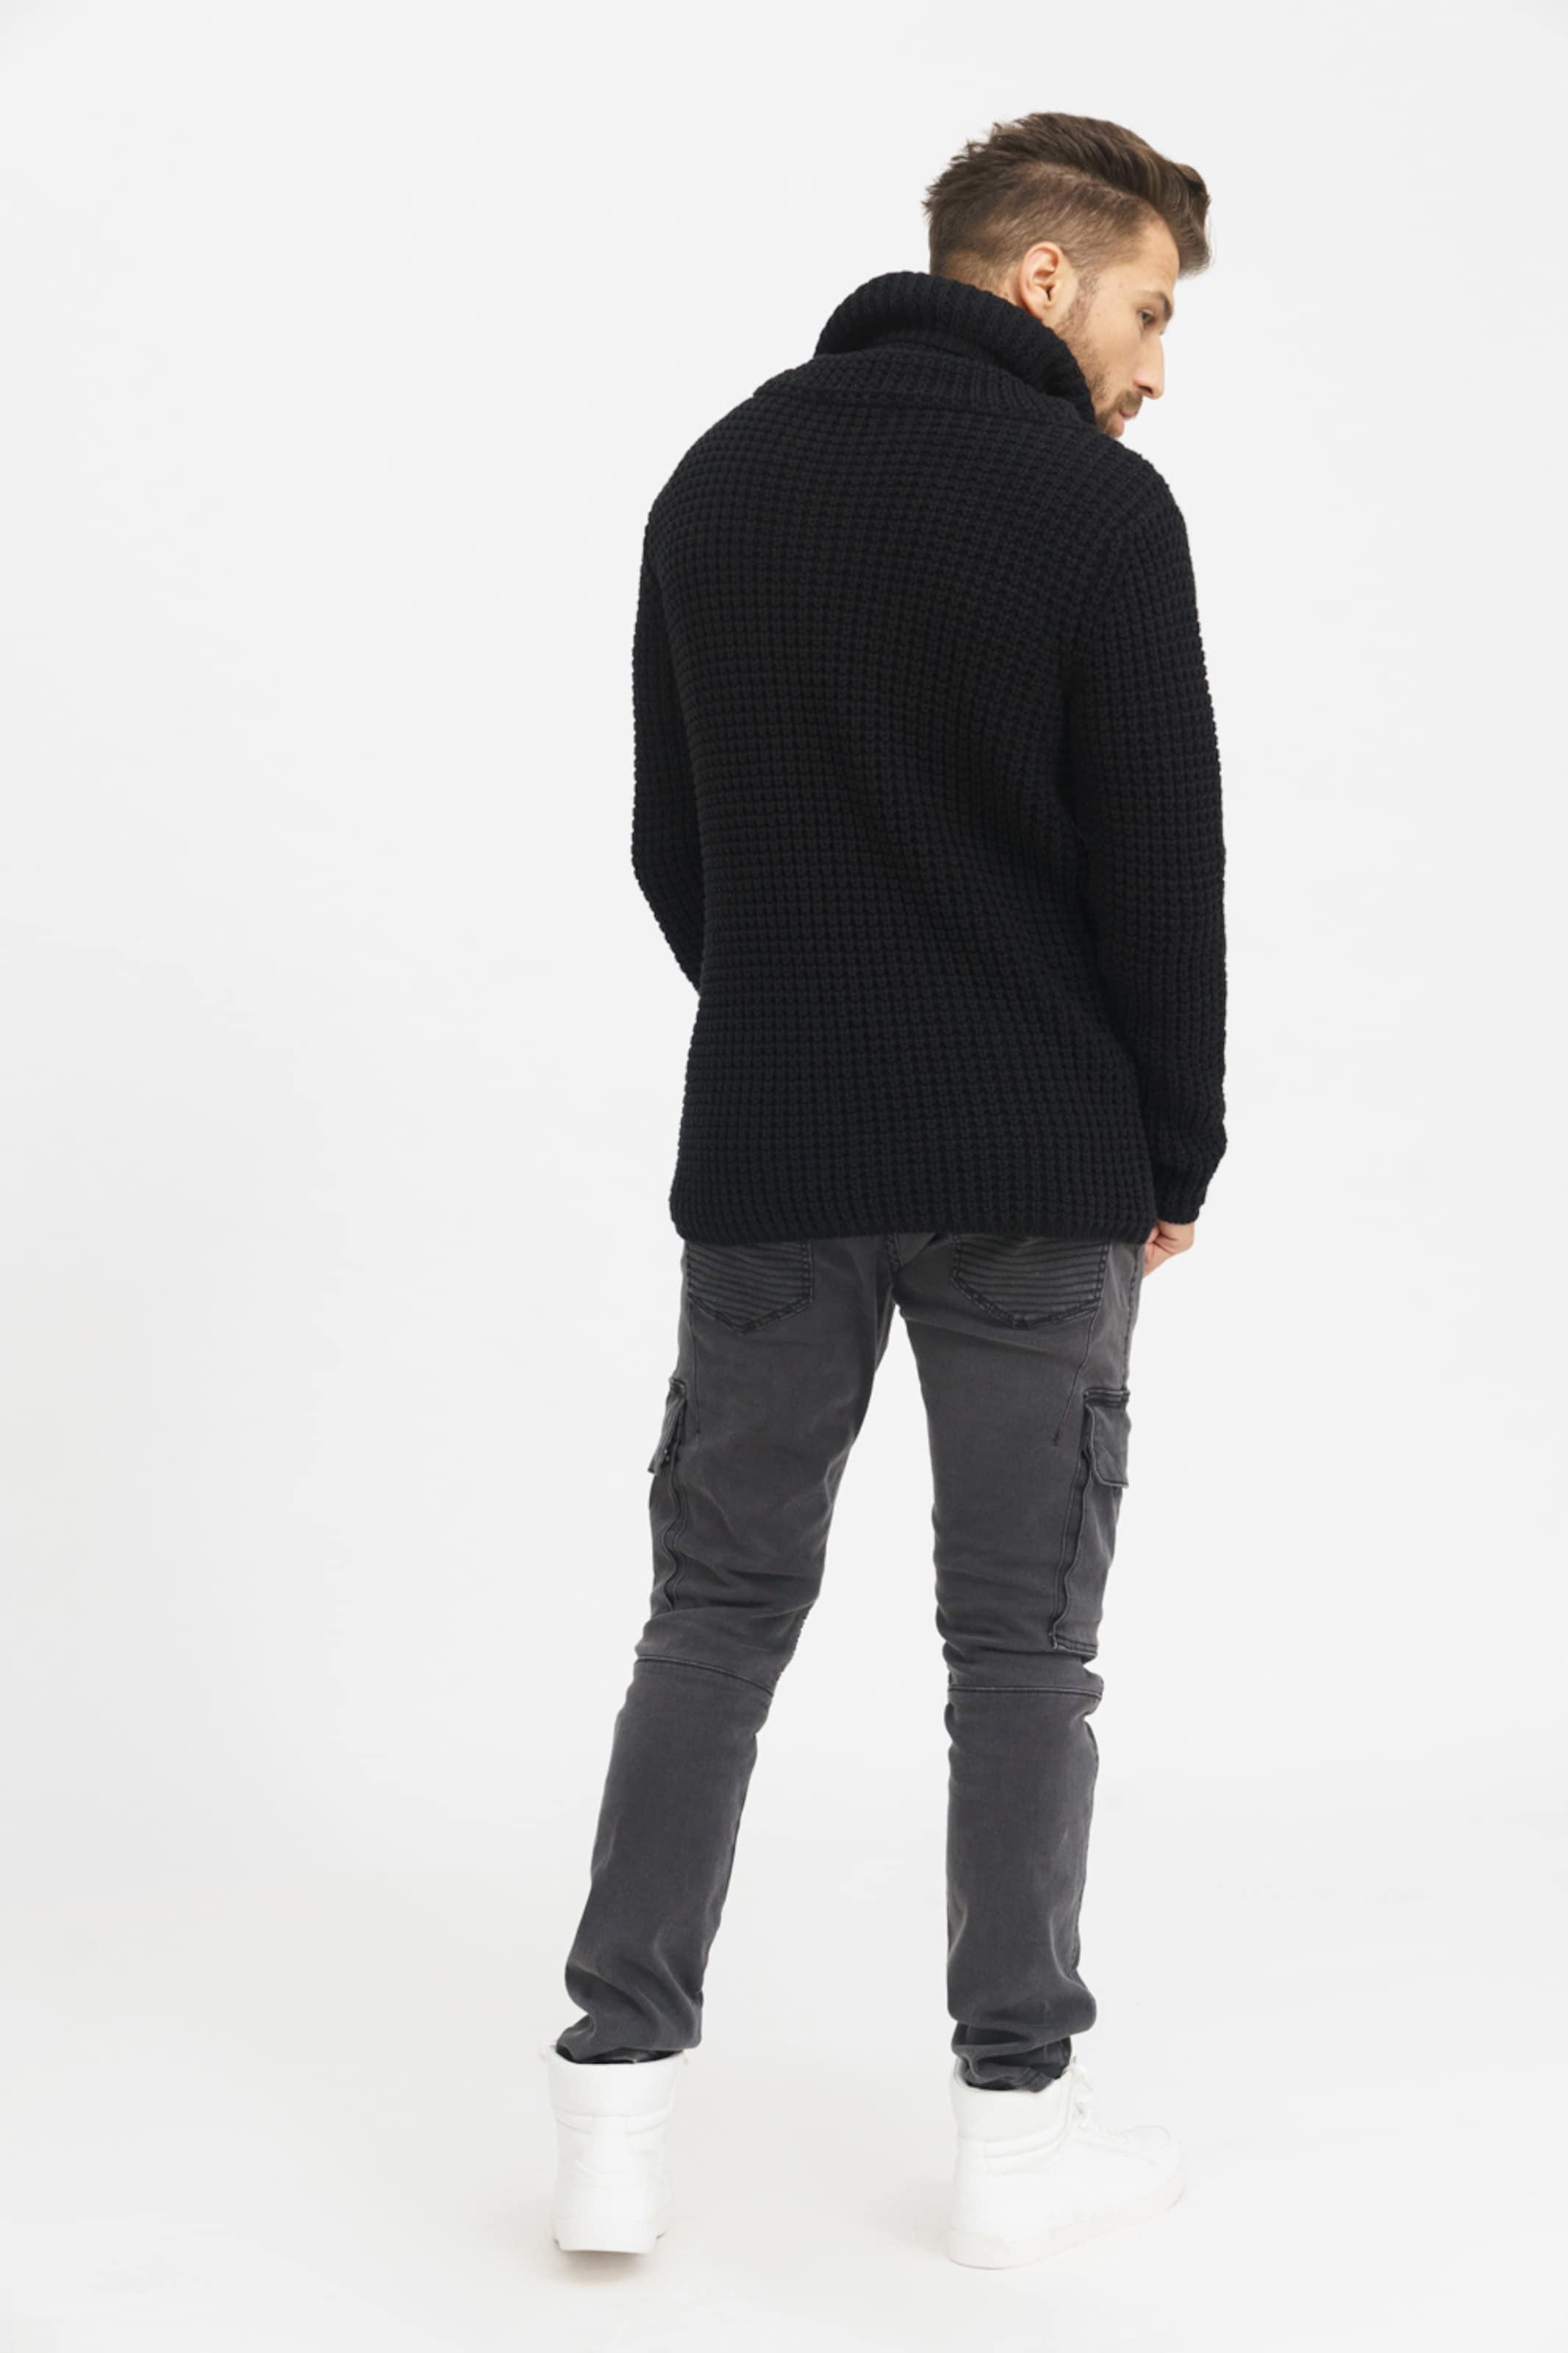 Trueprodigy Pullover 'finn' In Pullover 'finn' Trueprodigy Schwarz Schwarz In htsQCxdr